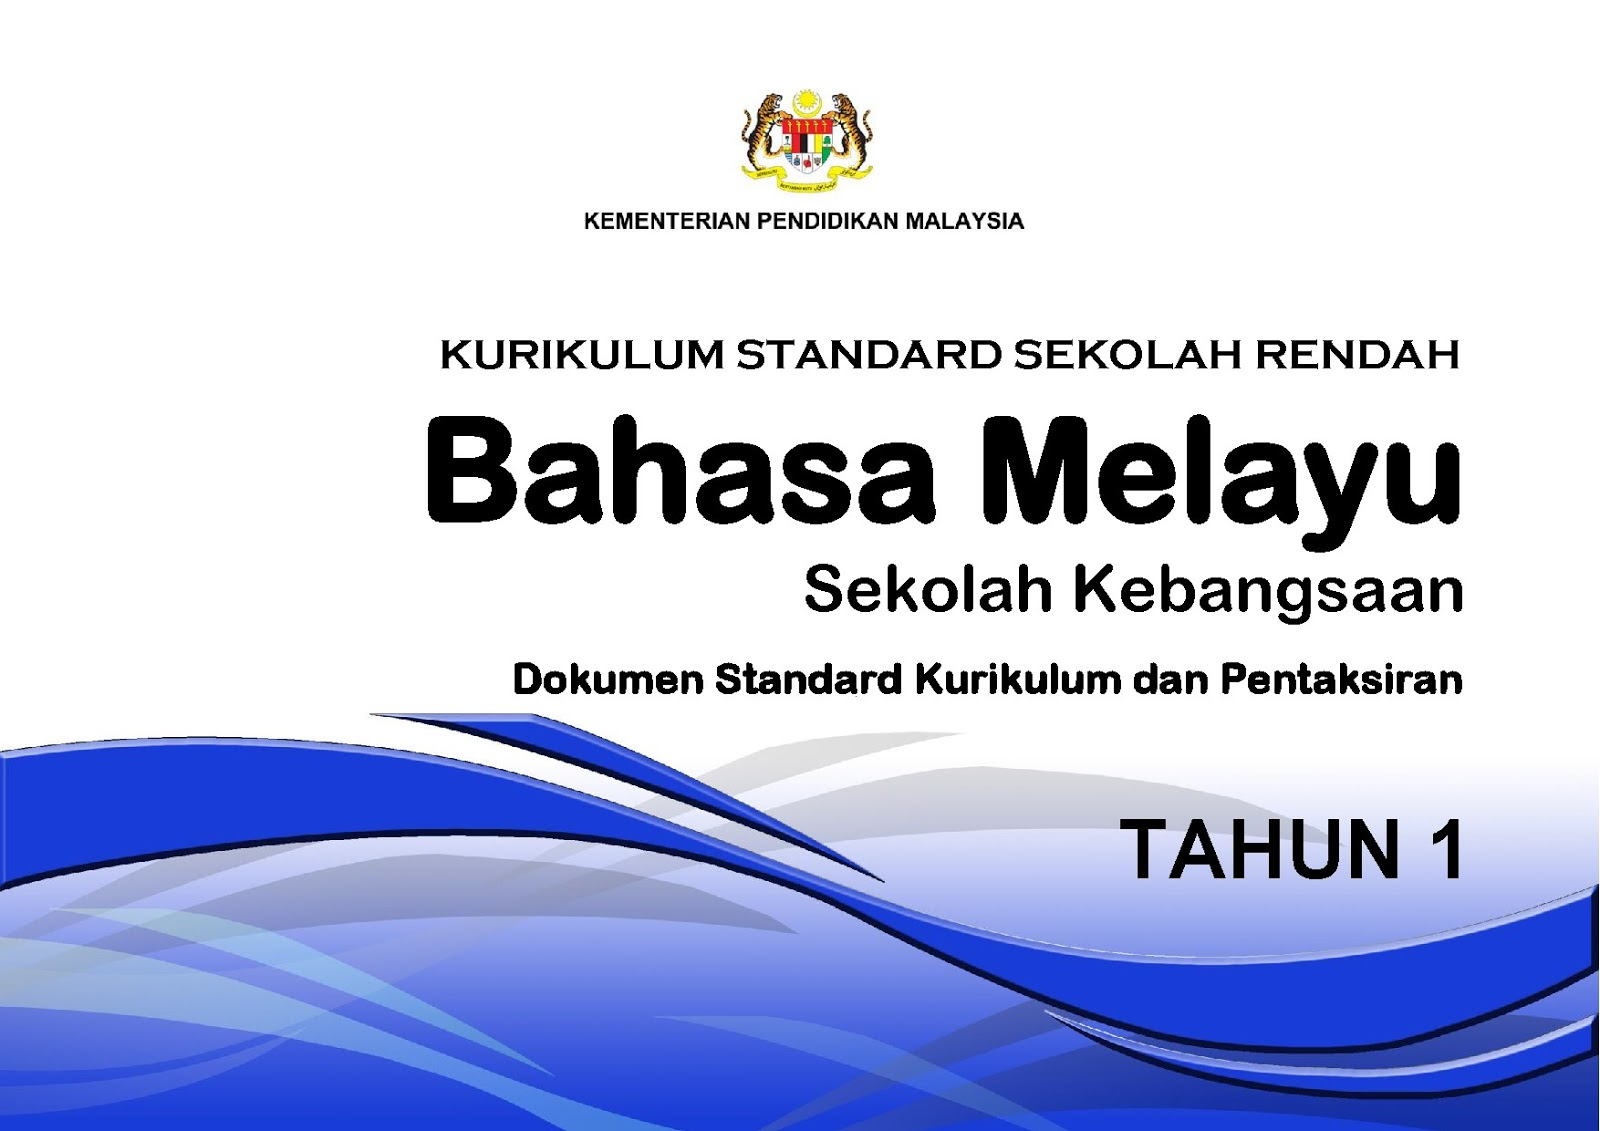 Dskp Bahasa Melayu Kssr Semakan Tahun 1